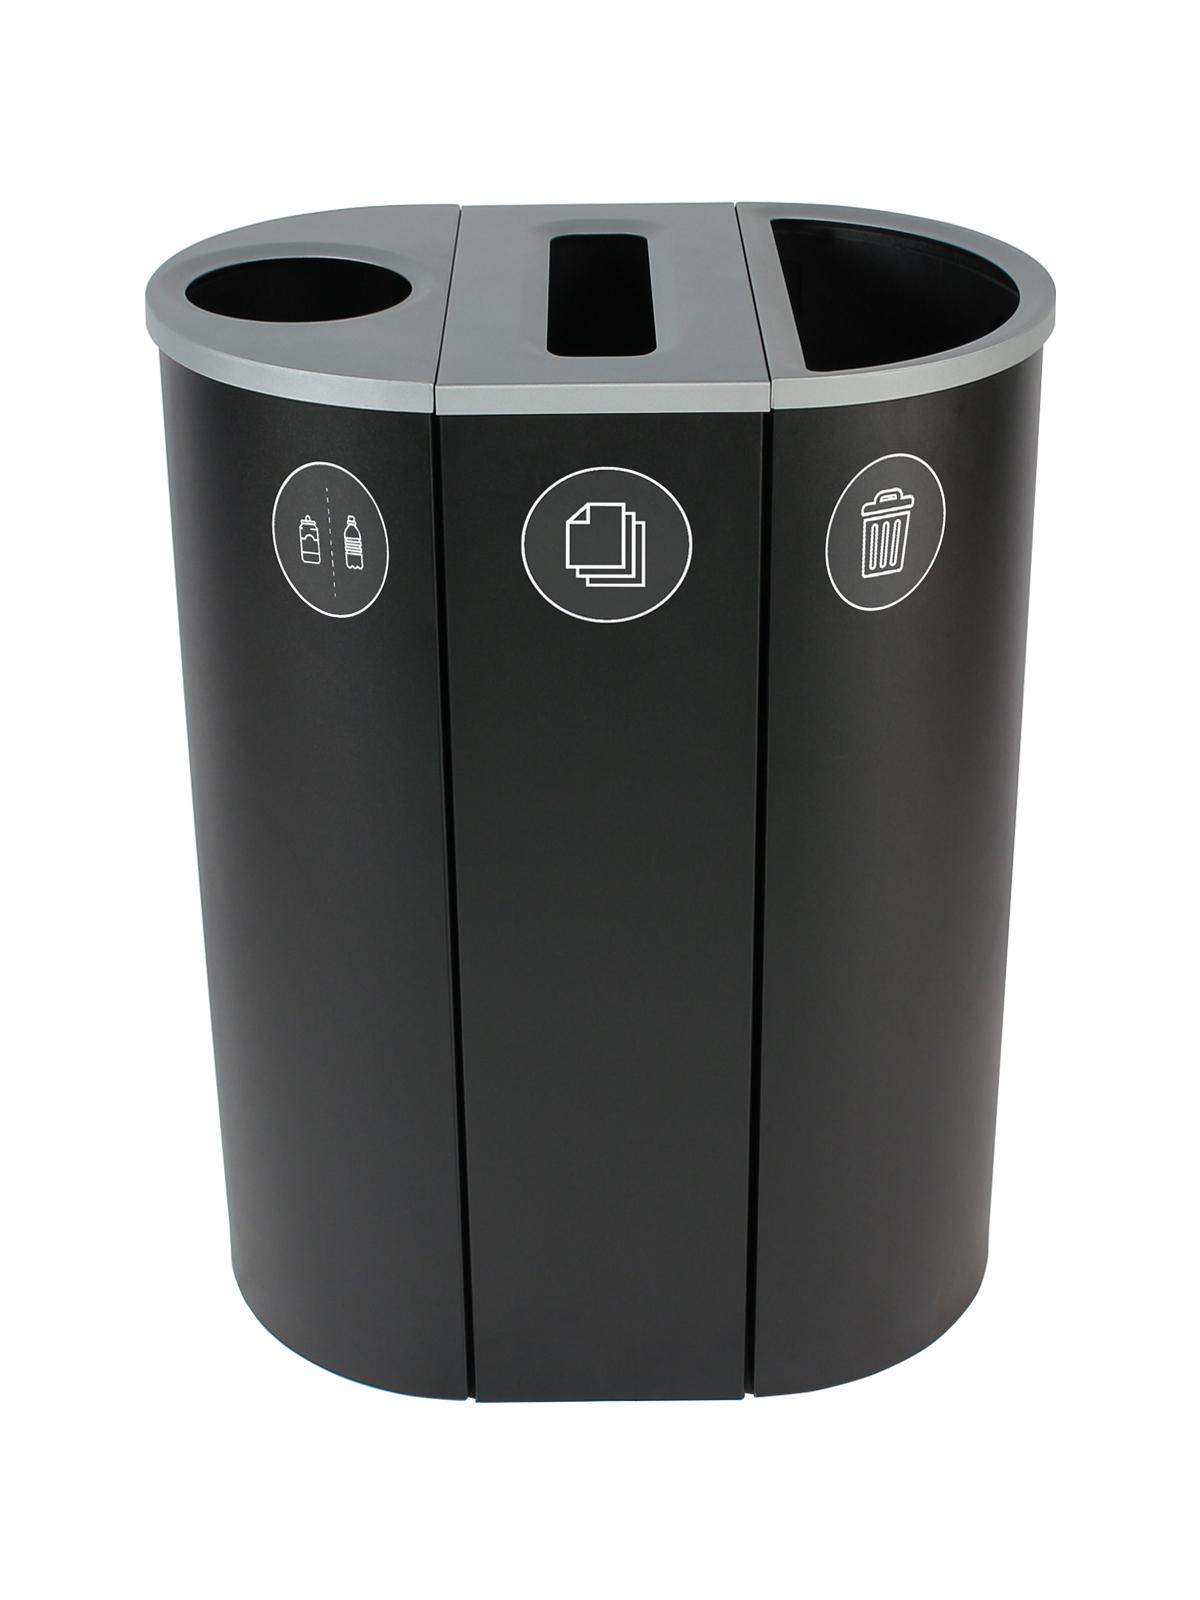 SPECTRUM - Triple - Cans & Bottles-Paper-Waste - Circle-Slot-Full - Black